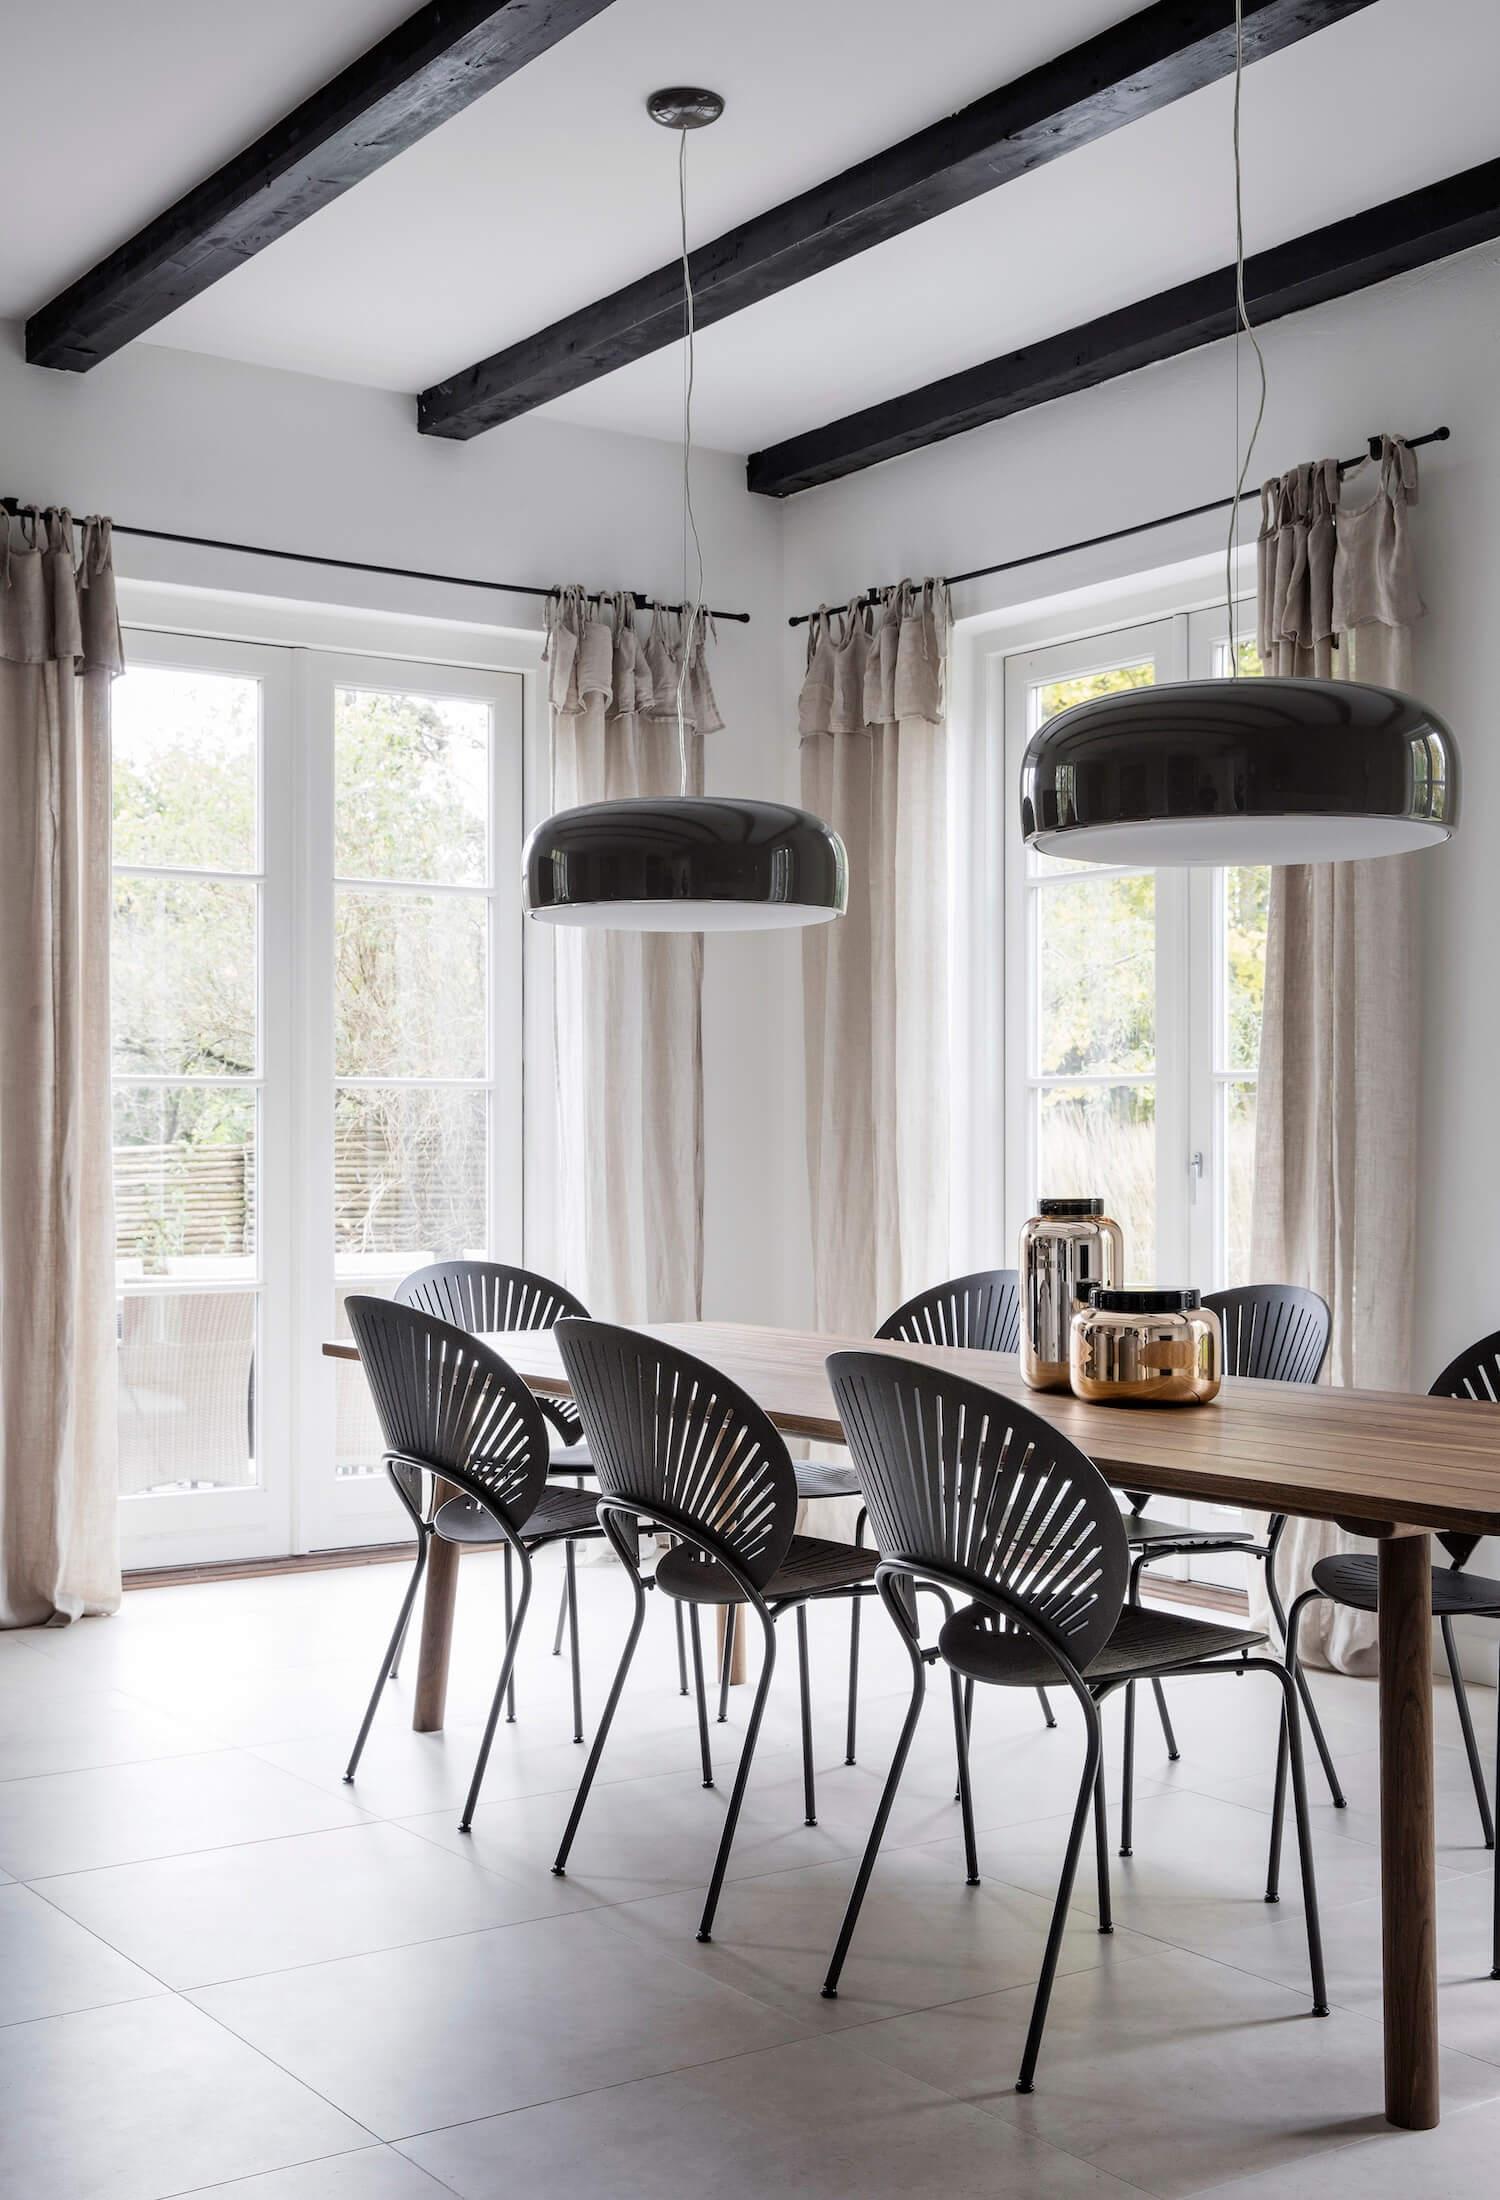 est living global interiors copenhagen home Kitchen5